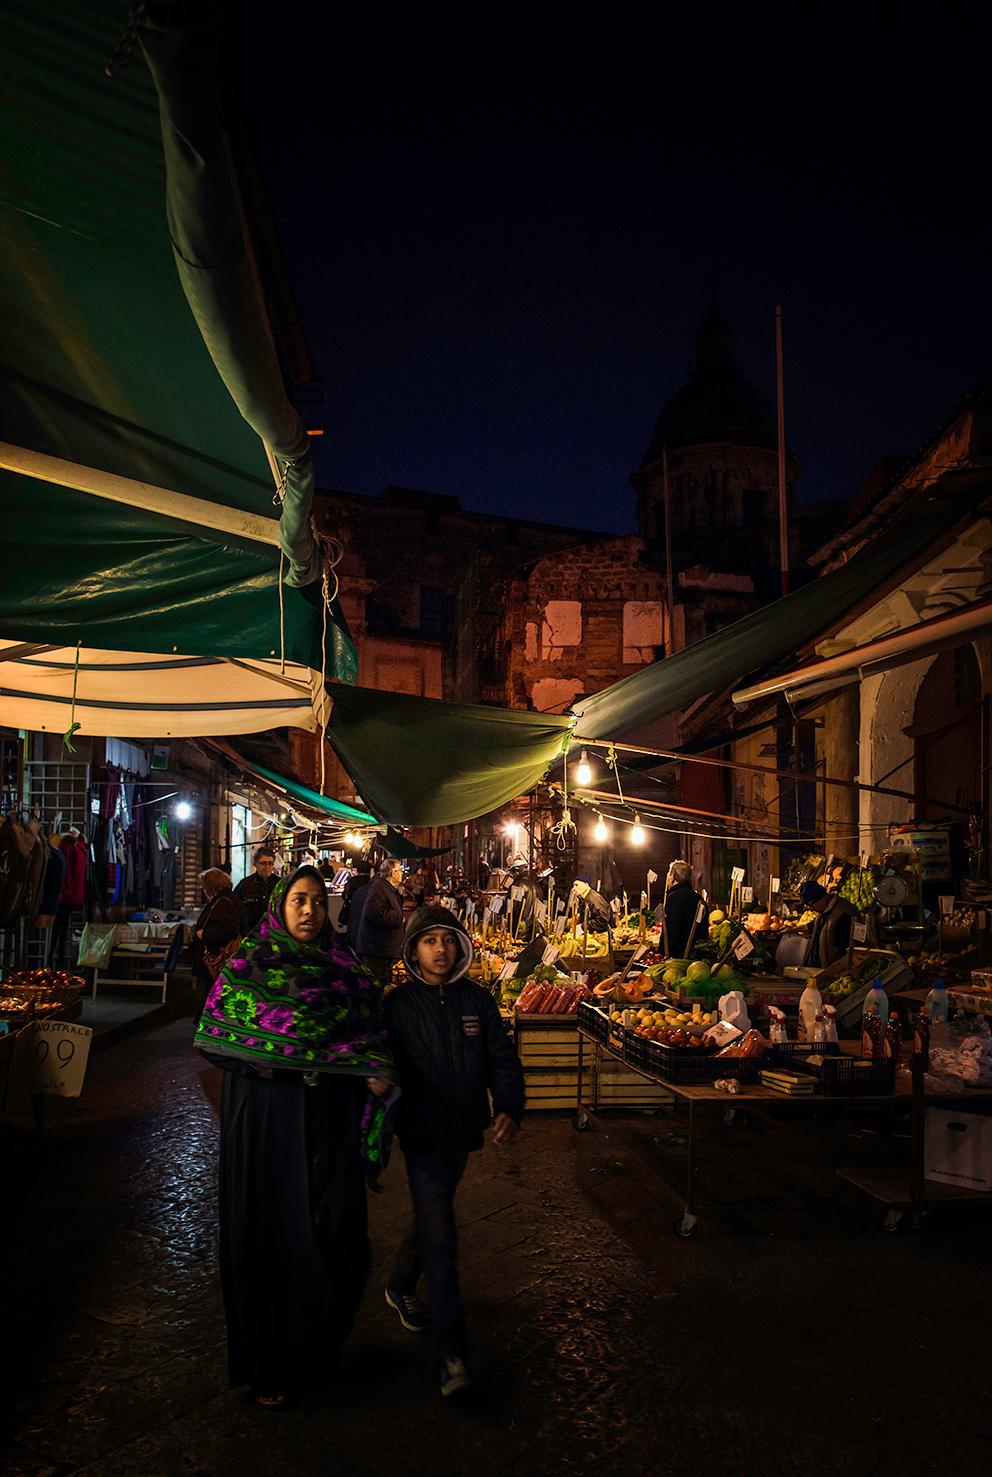 Mother and child (Ballarò market)